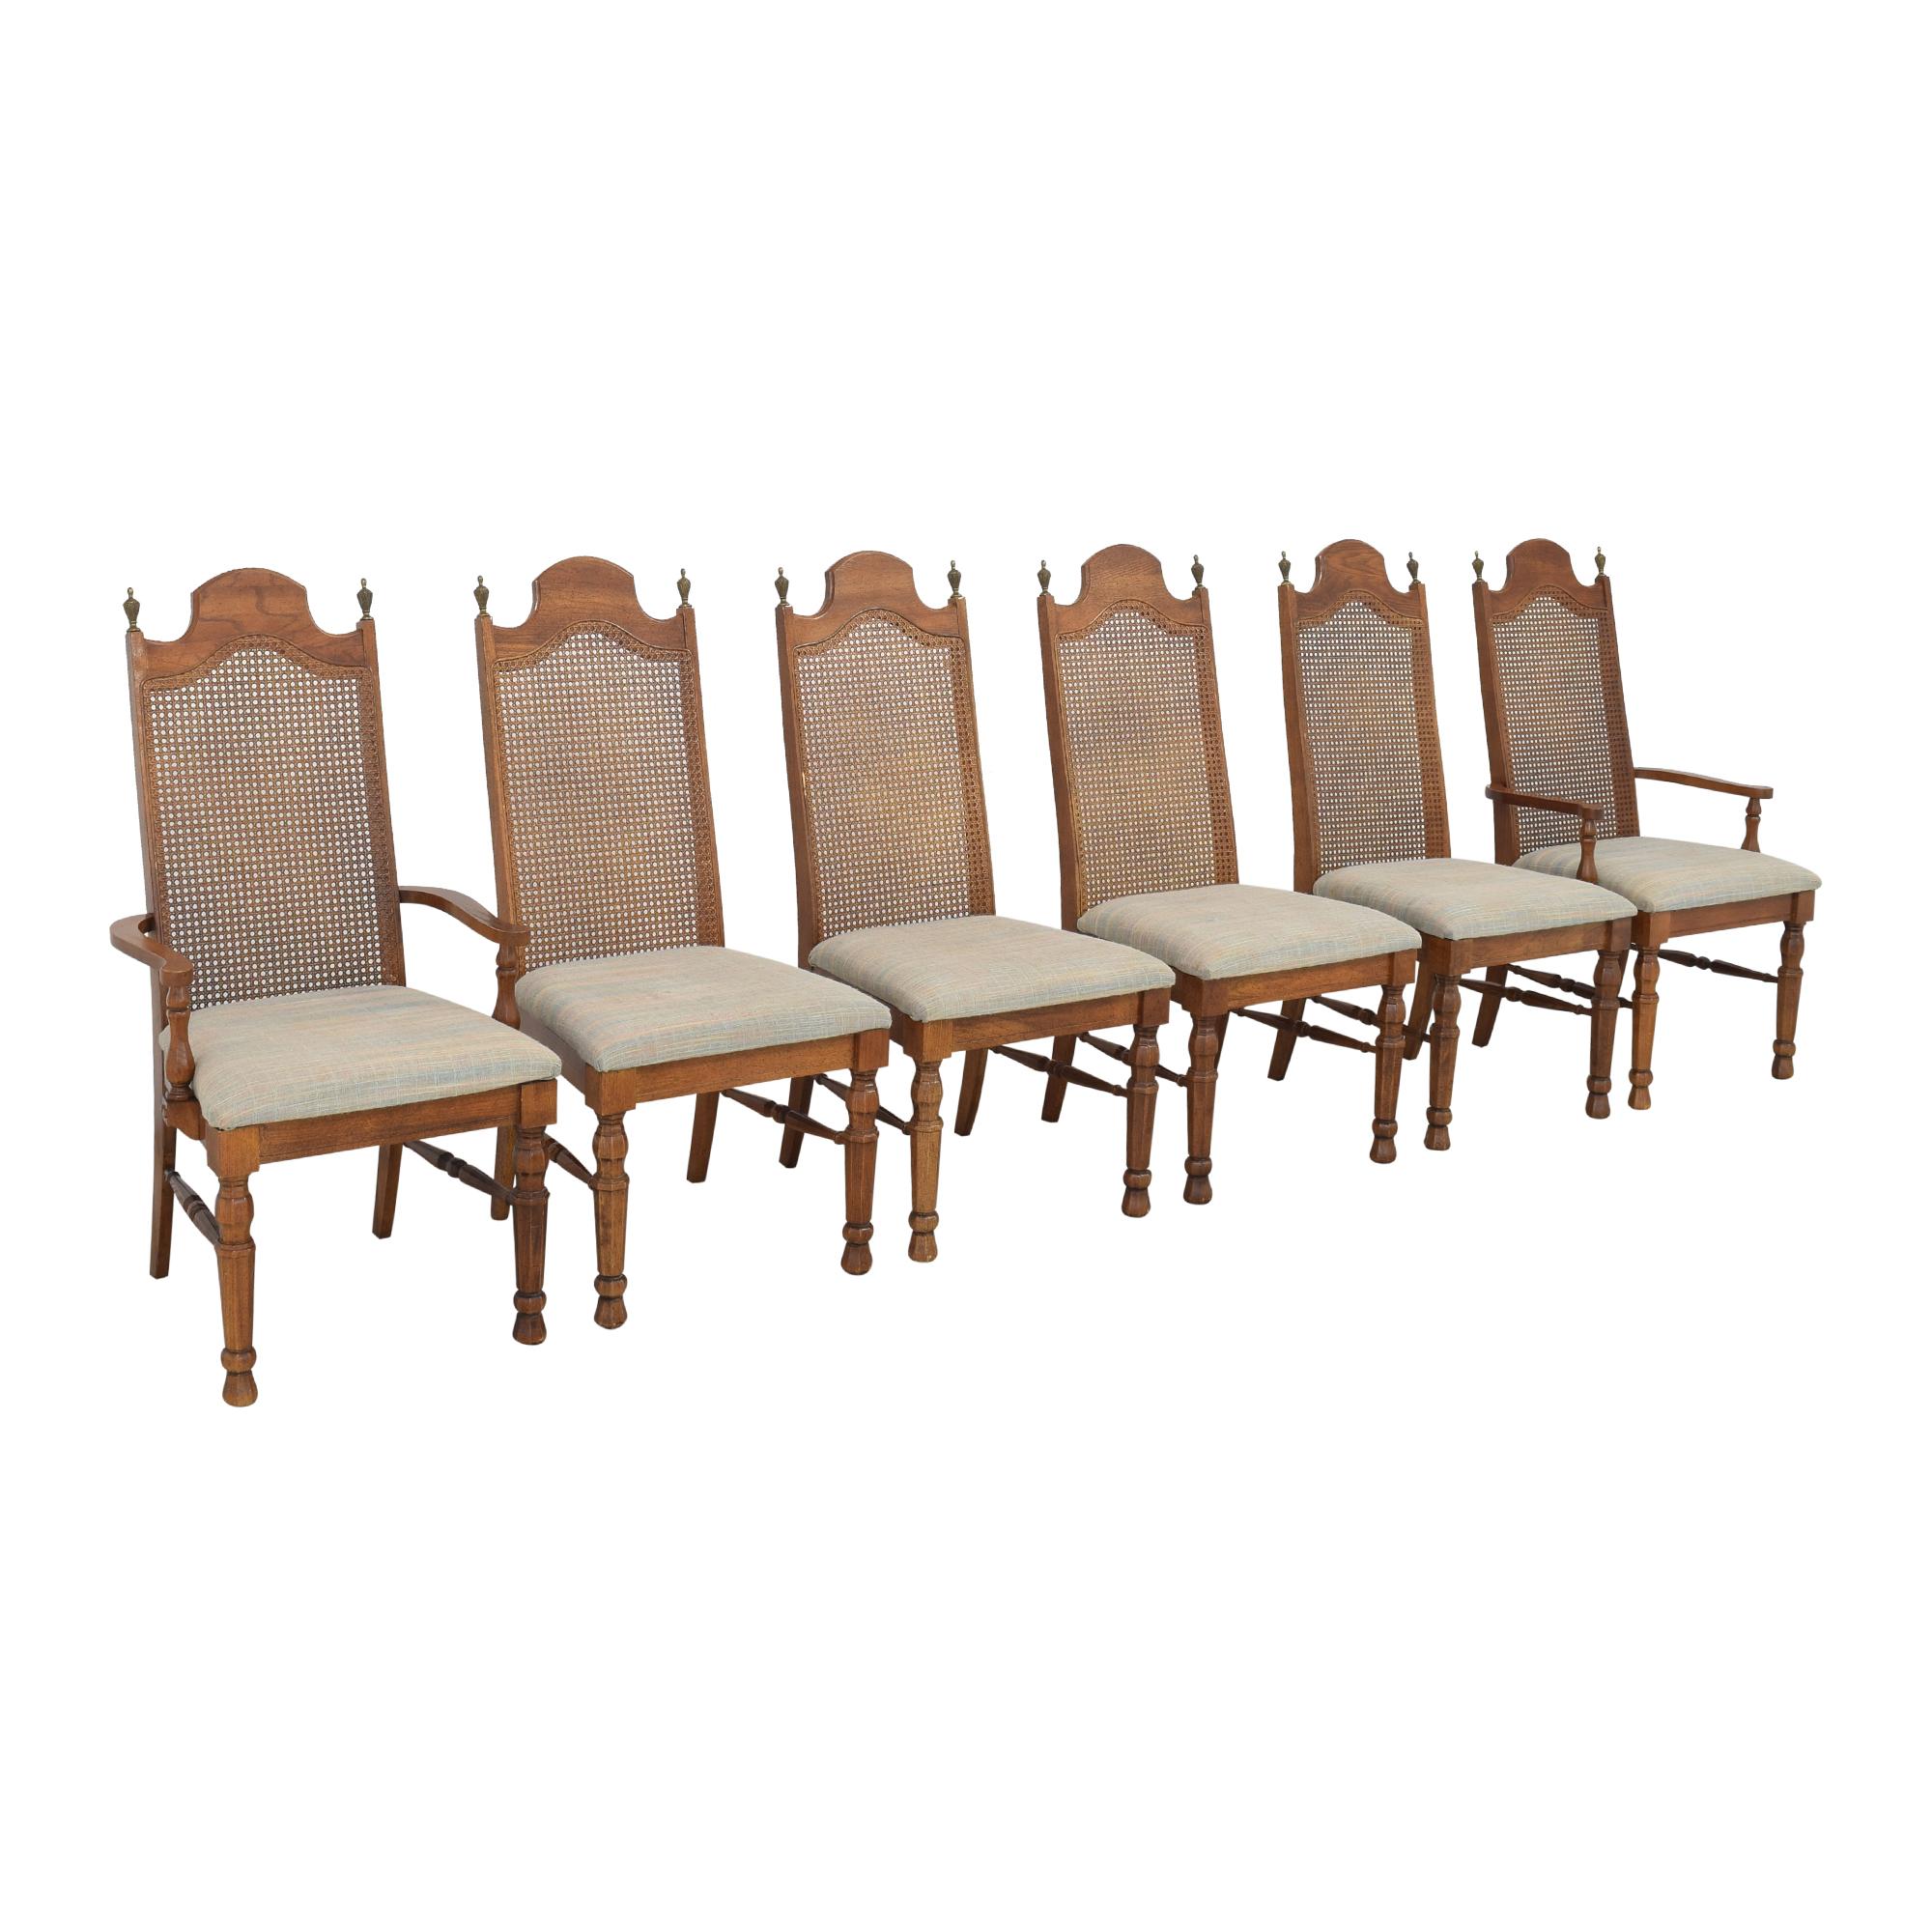 buy Lenoir Cane Back Dining Chairs Lenoir Chair Company Chairs